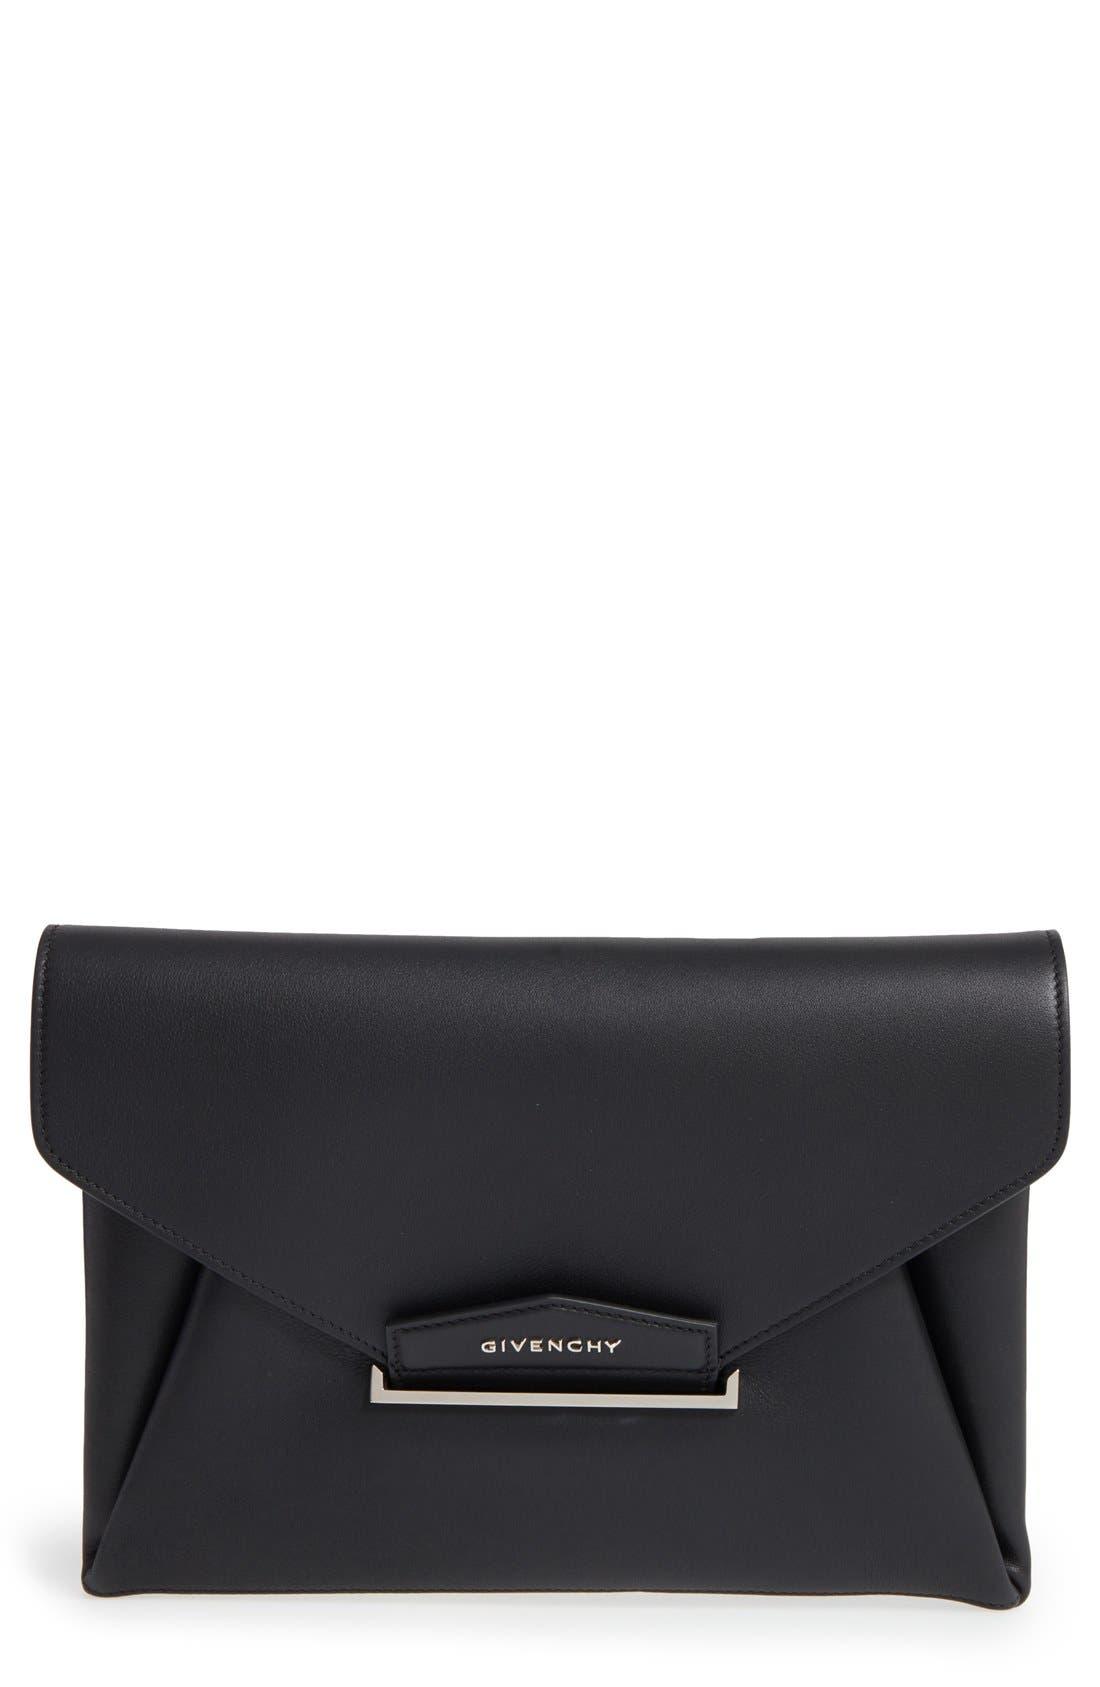 Main Image - Givenchy 'Medium Antigona' Leather Envelope Clutch